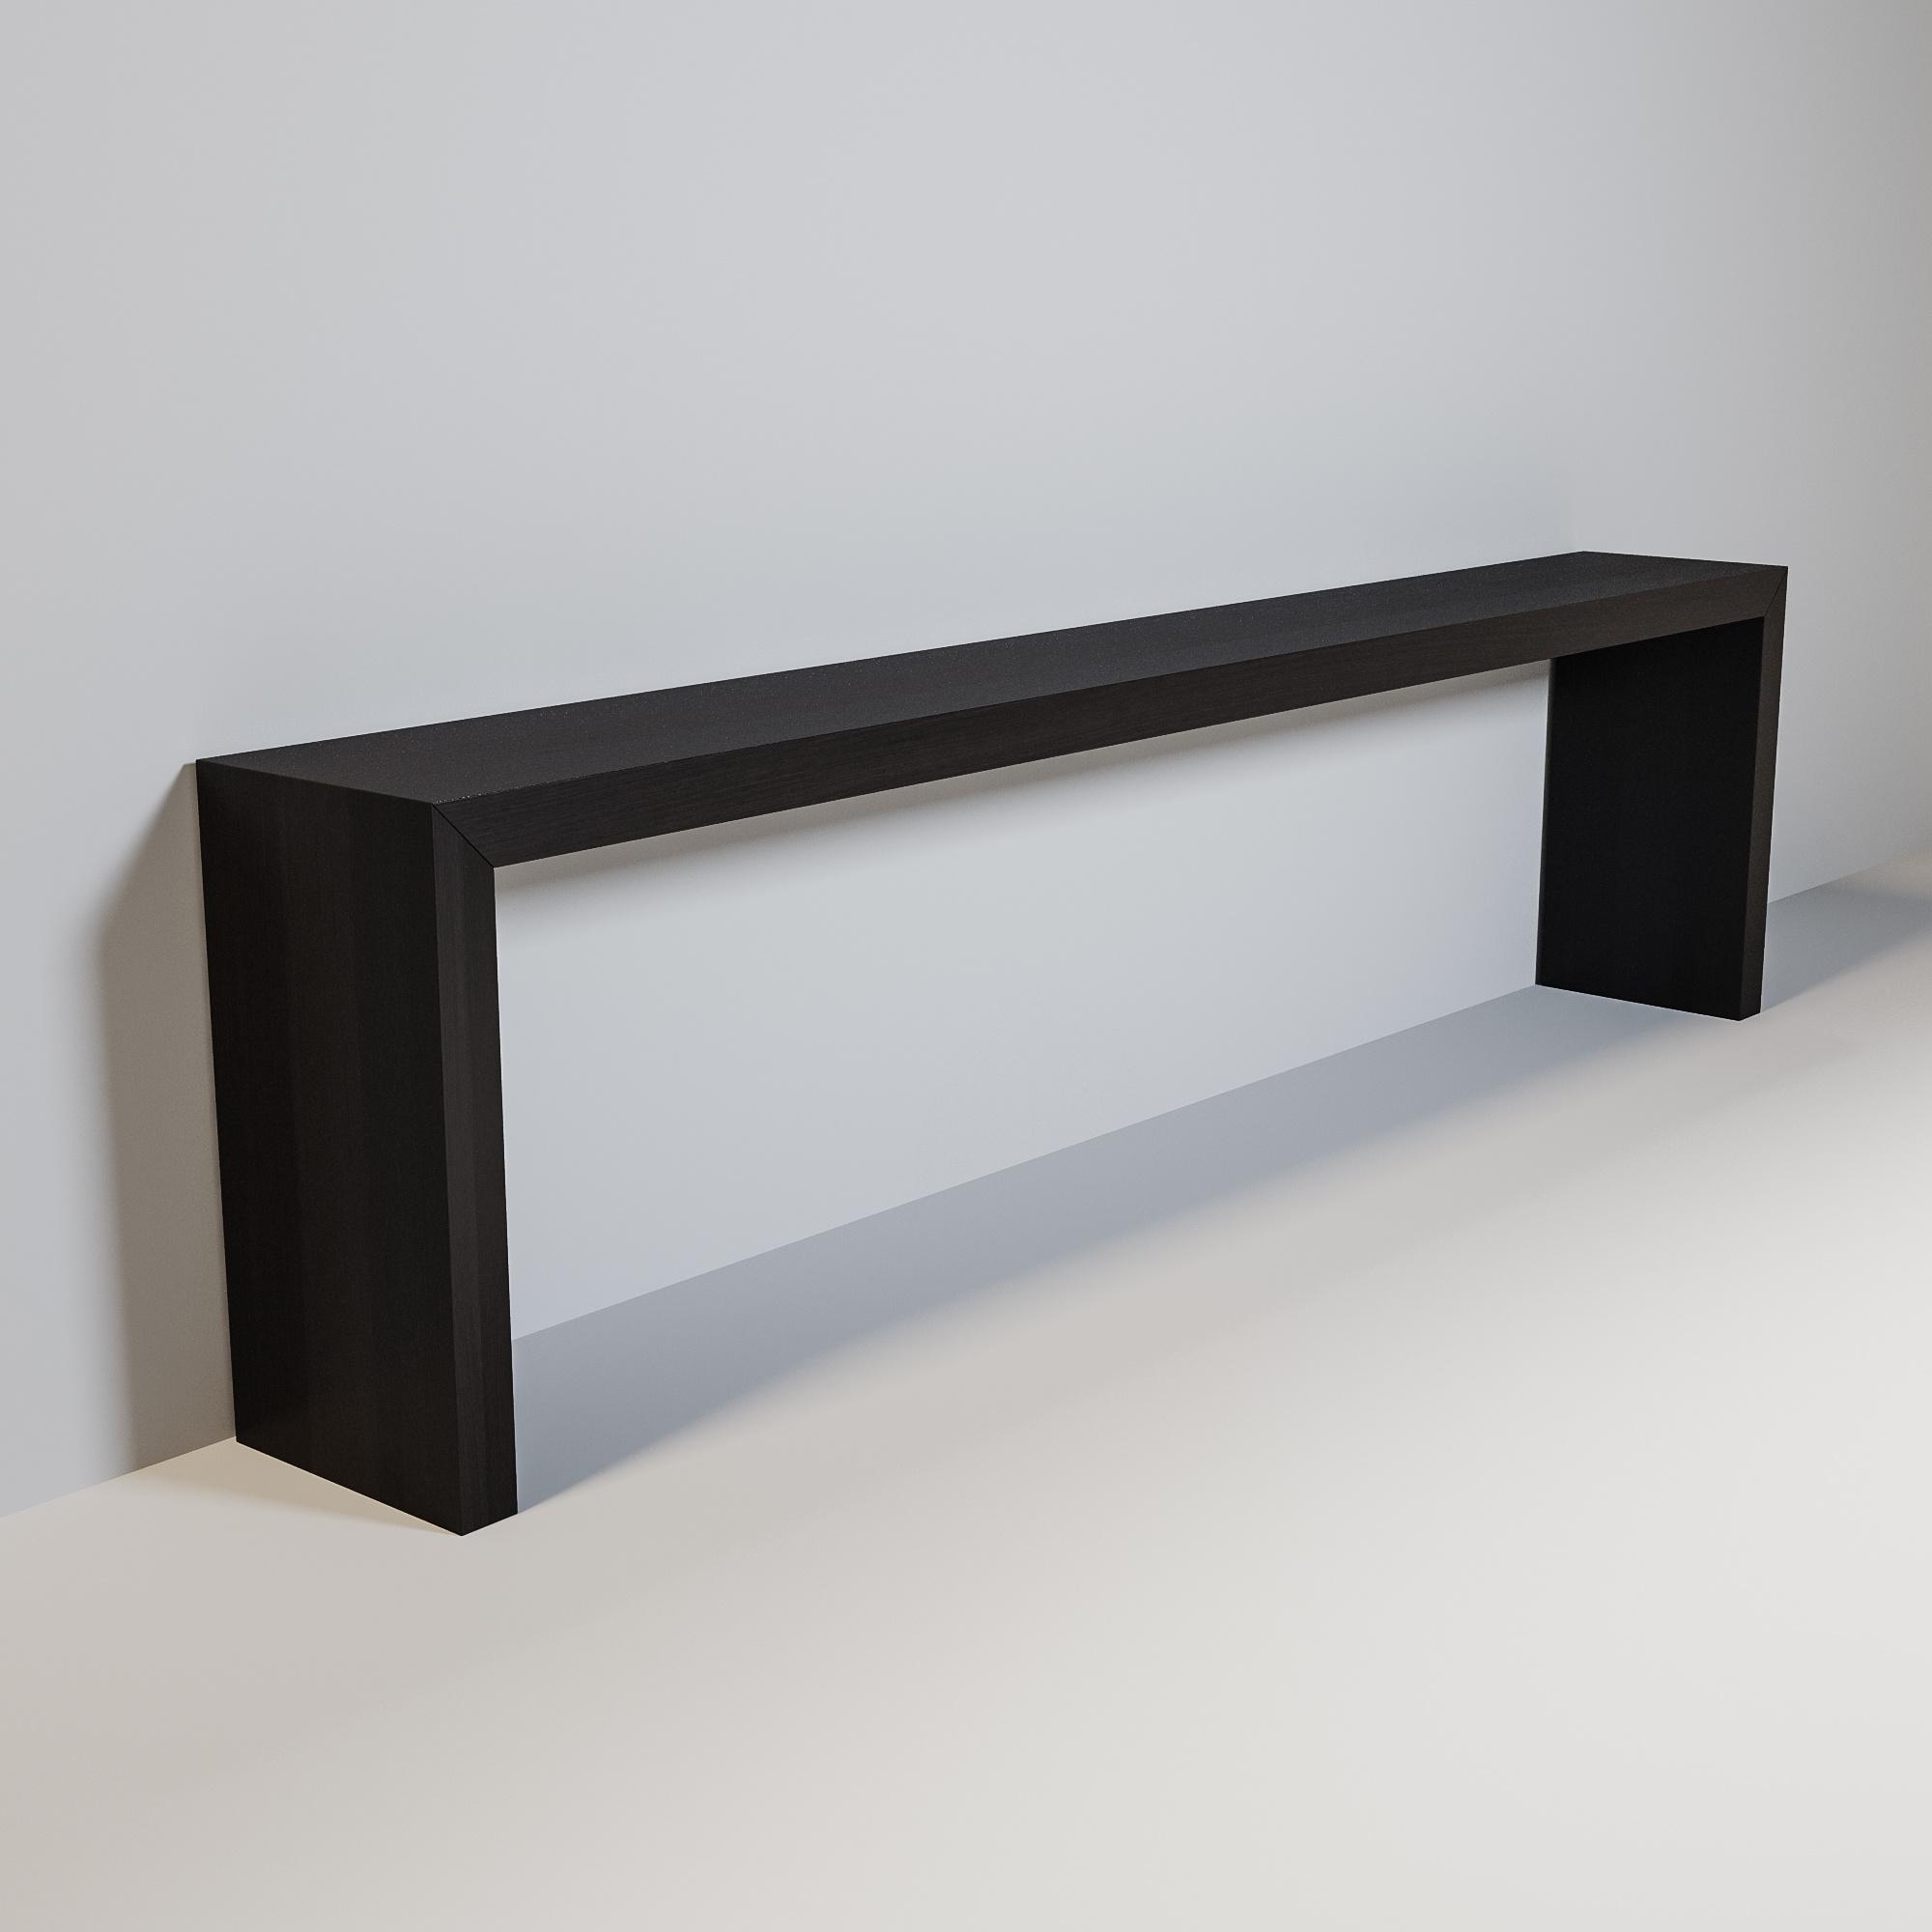 MAYFAIR Console smoke wood 300cm-1